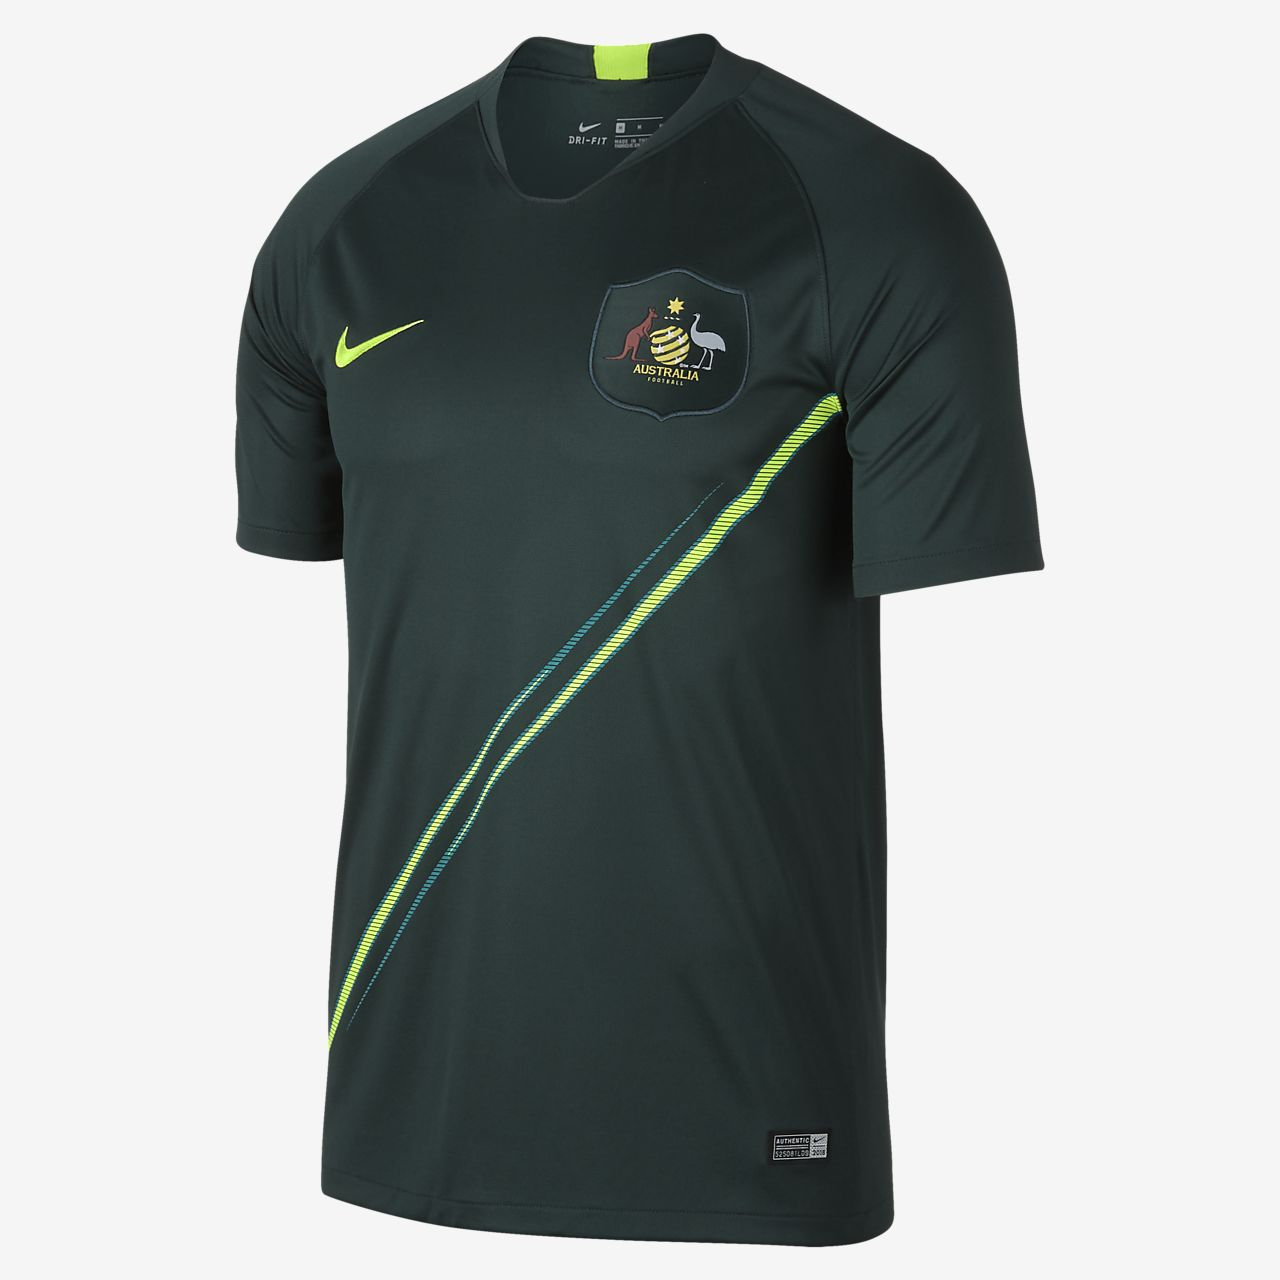 Camiseta de fútbol para hombre 2018 Australia Stadium Away